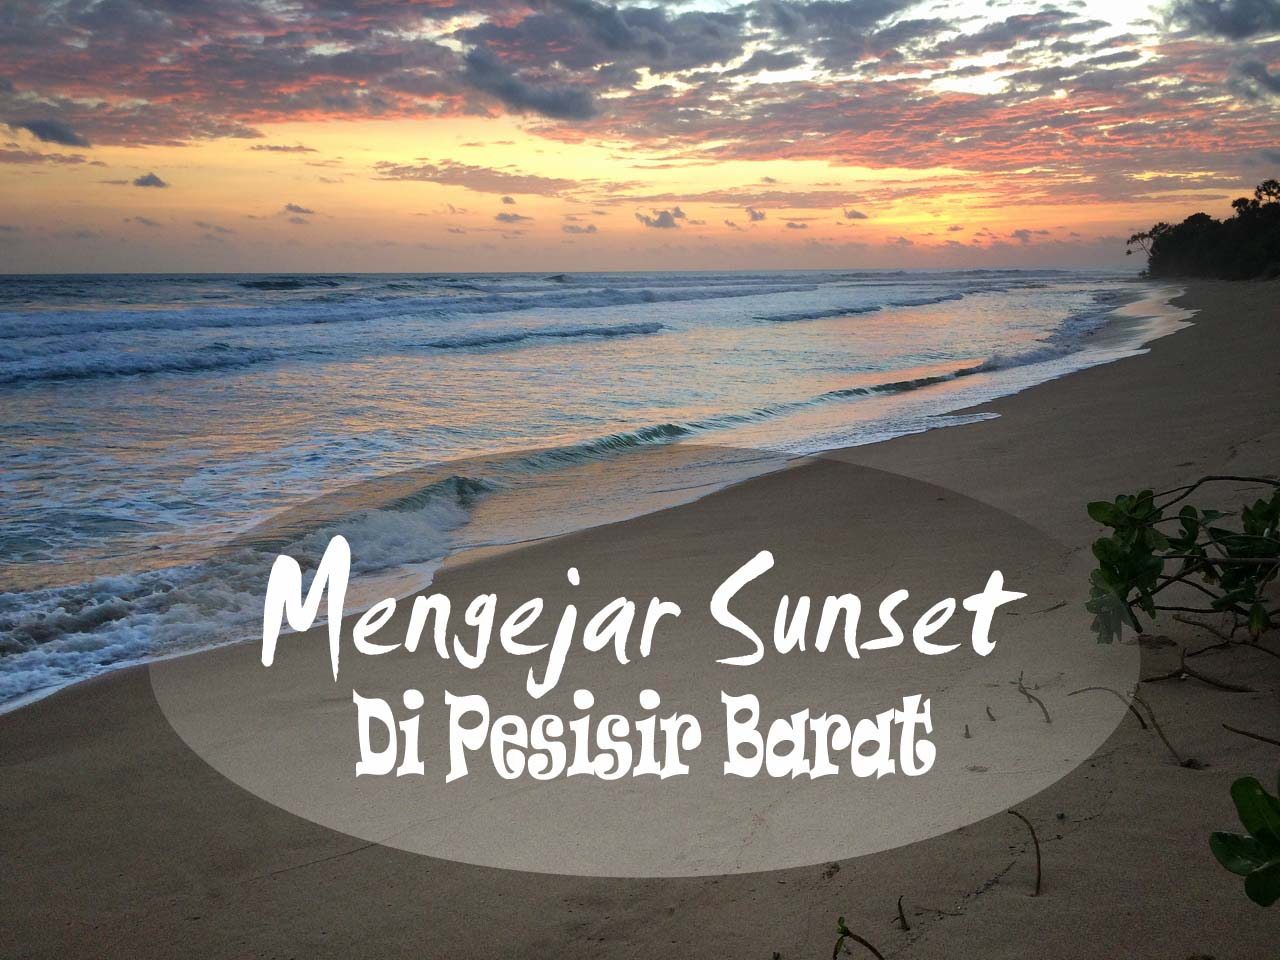 Mengejar Sunset di Pantai Pesisir Barat Lampung- Yopie Pangkey